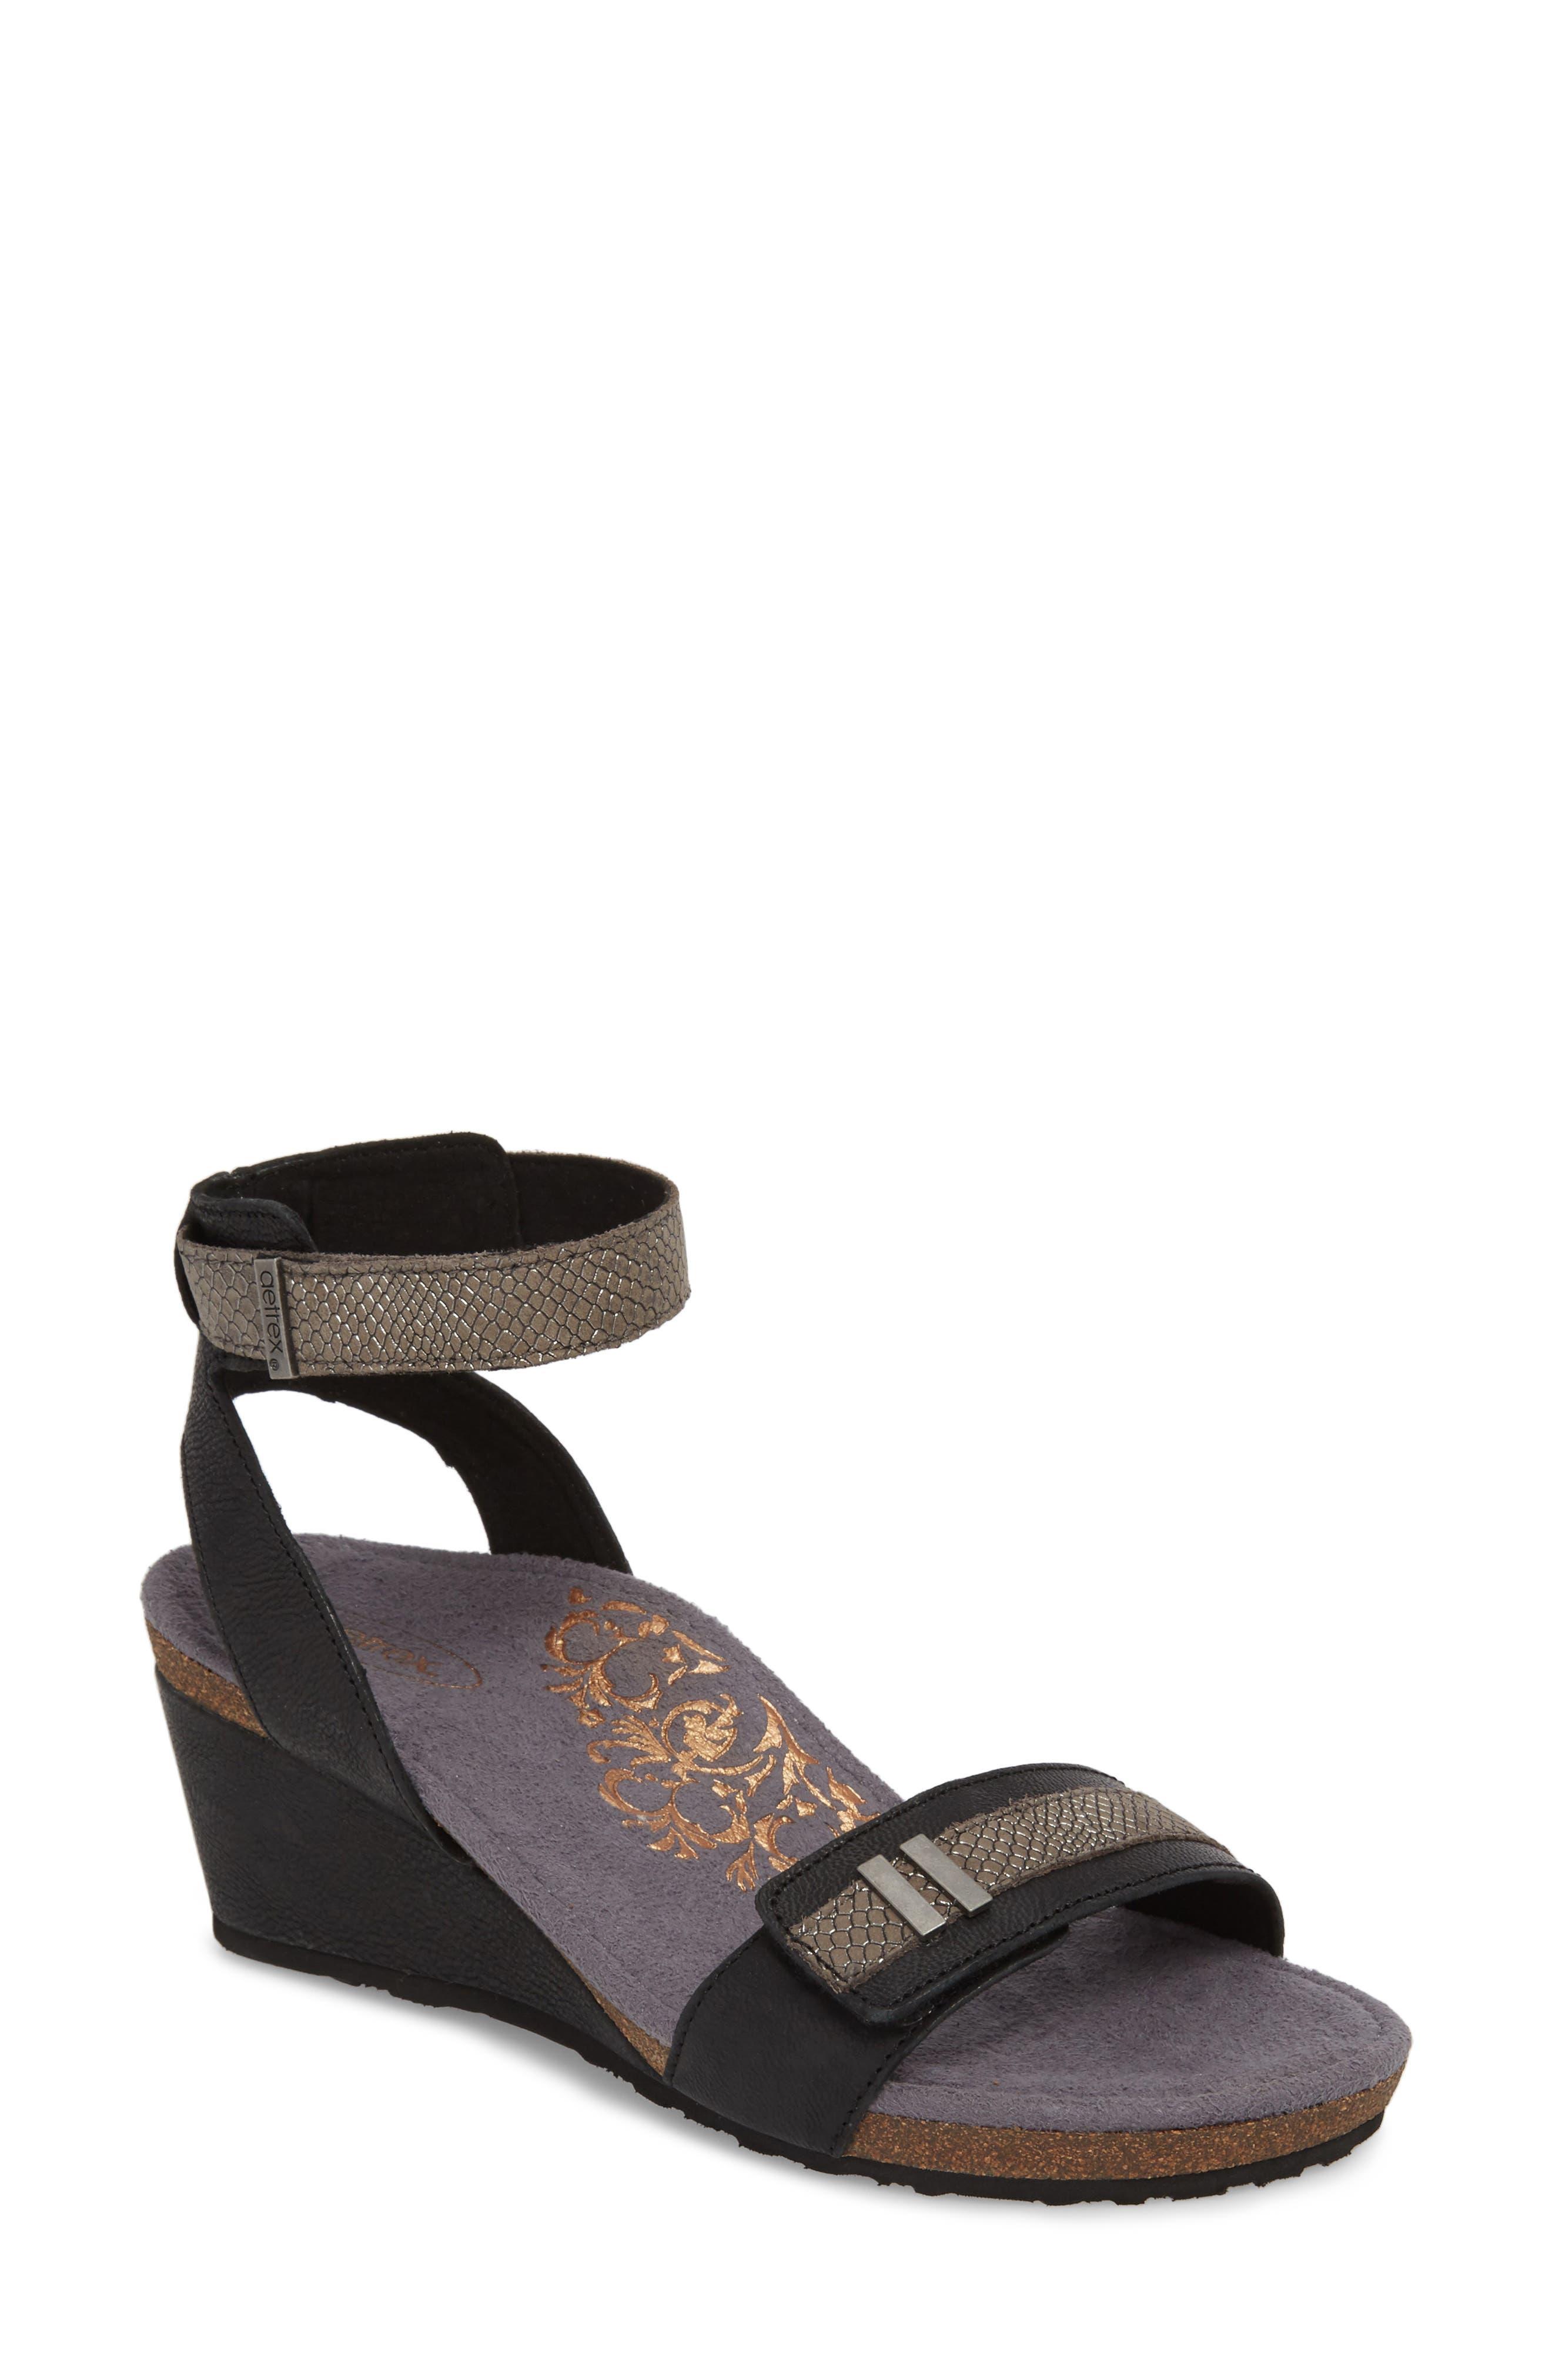 Aetrex Gia Wedge Sandal (Women)